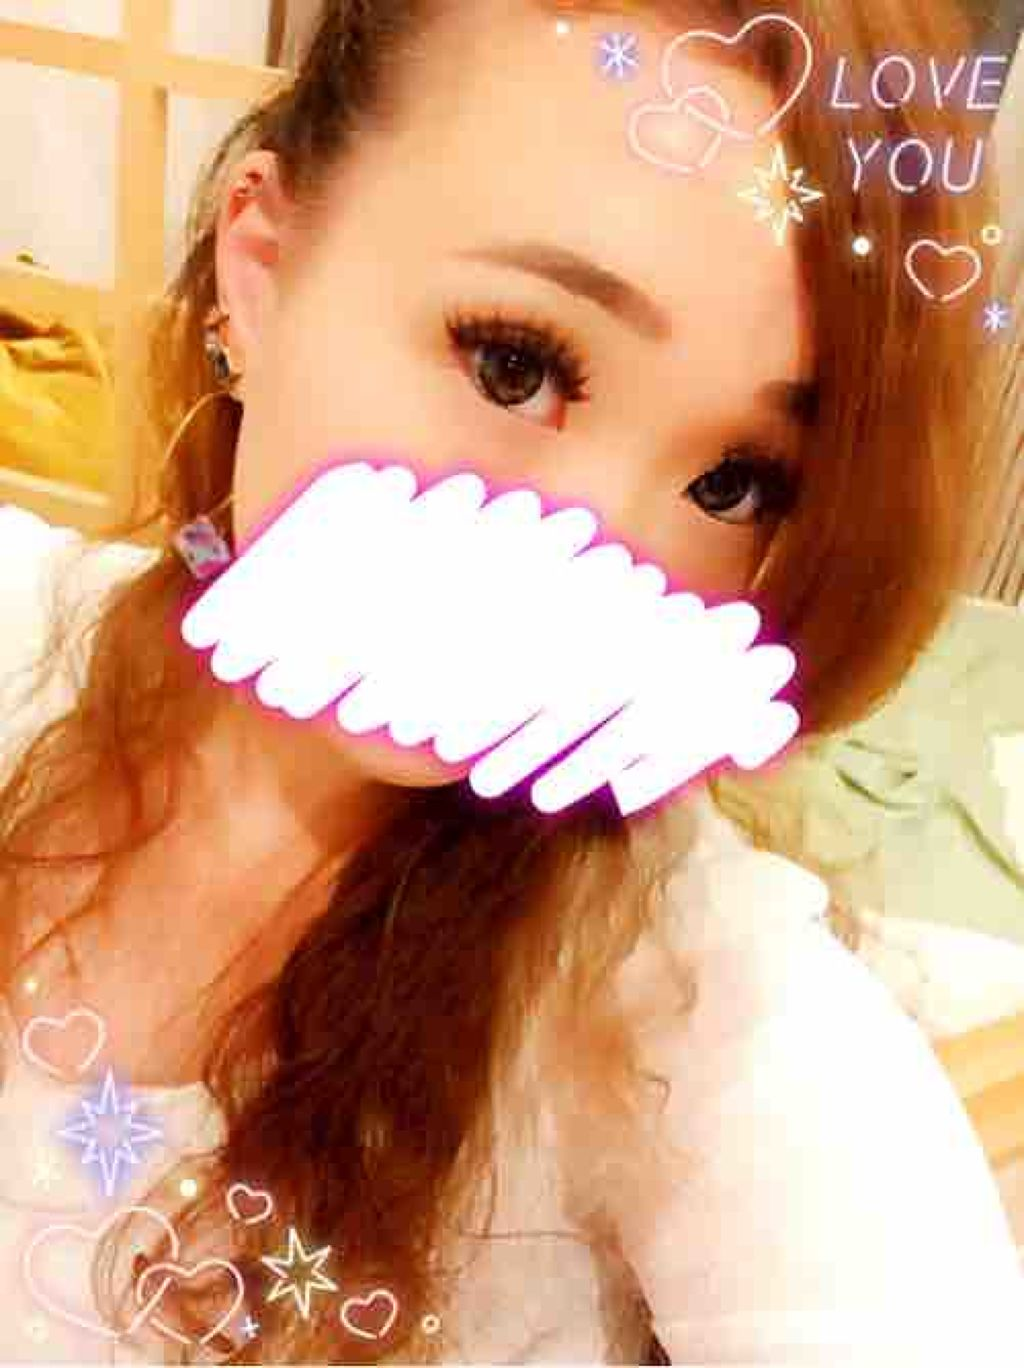 colorful_blush_vru